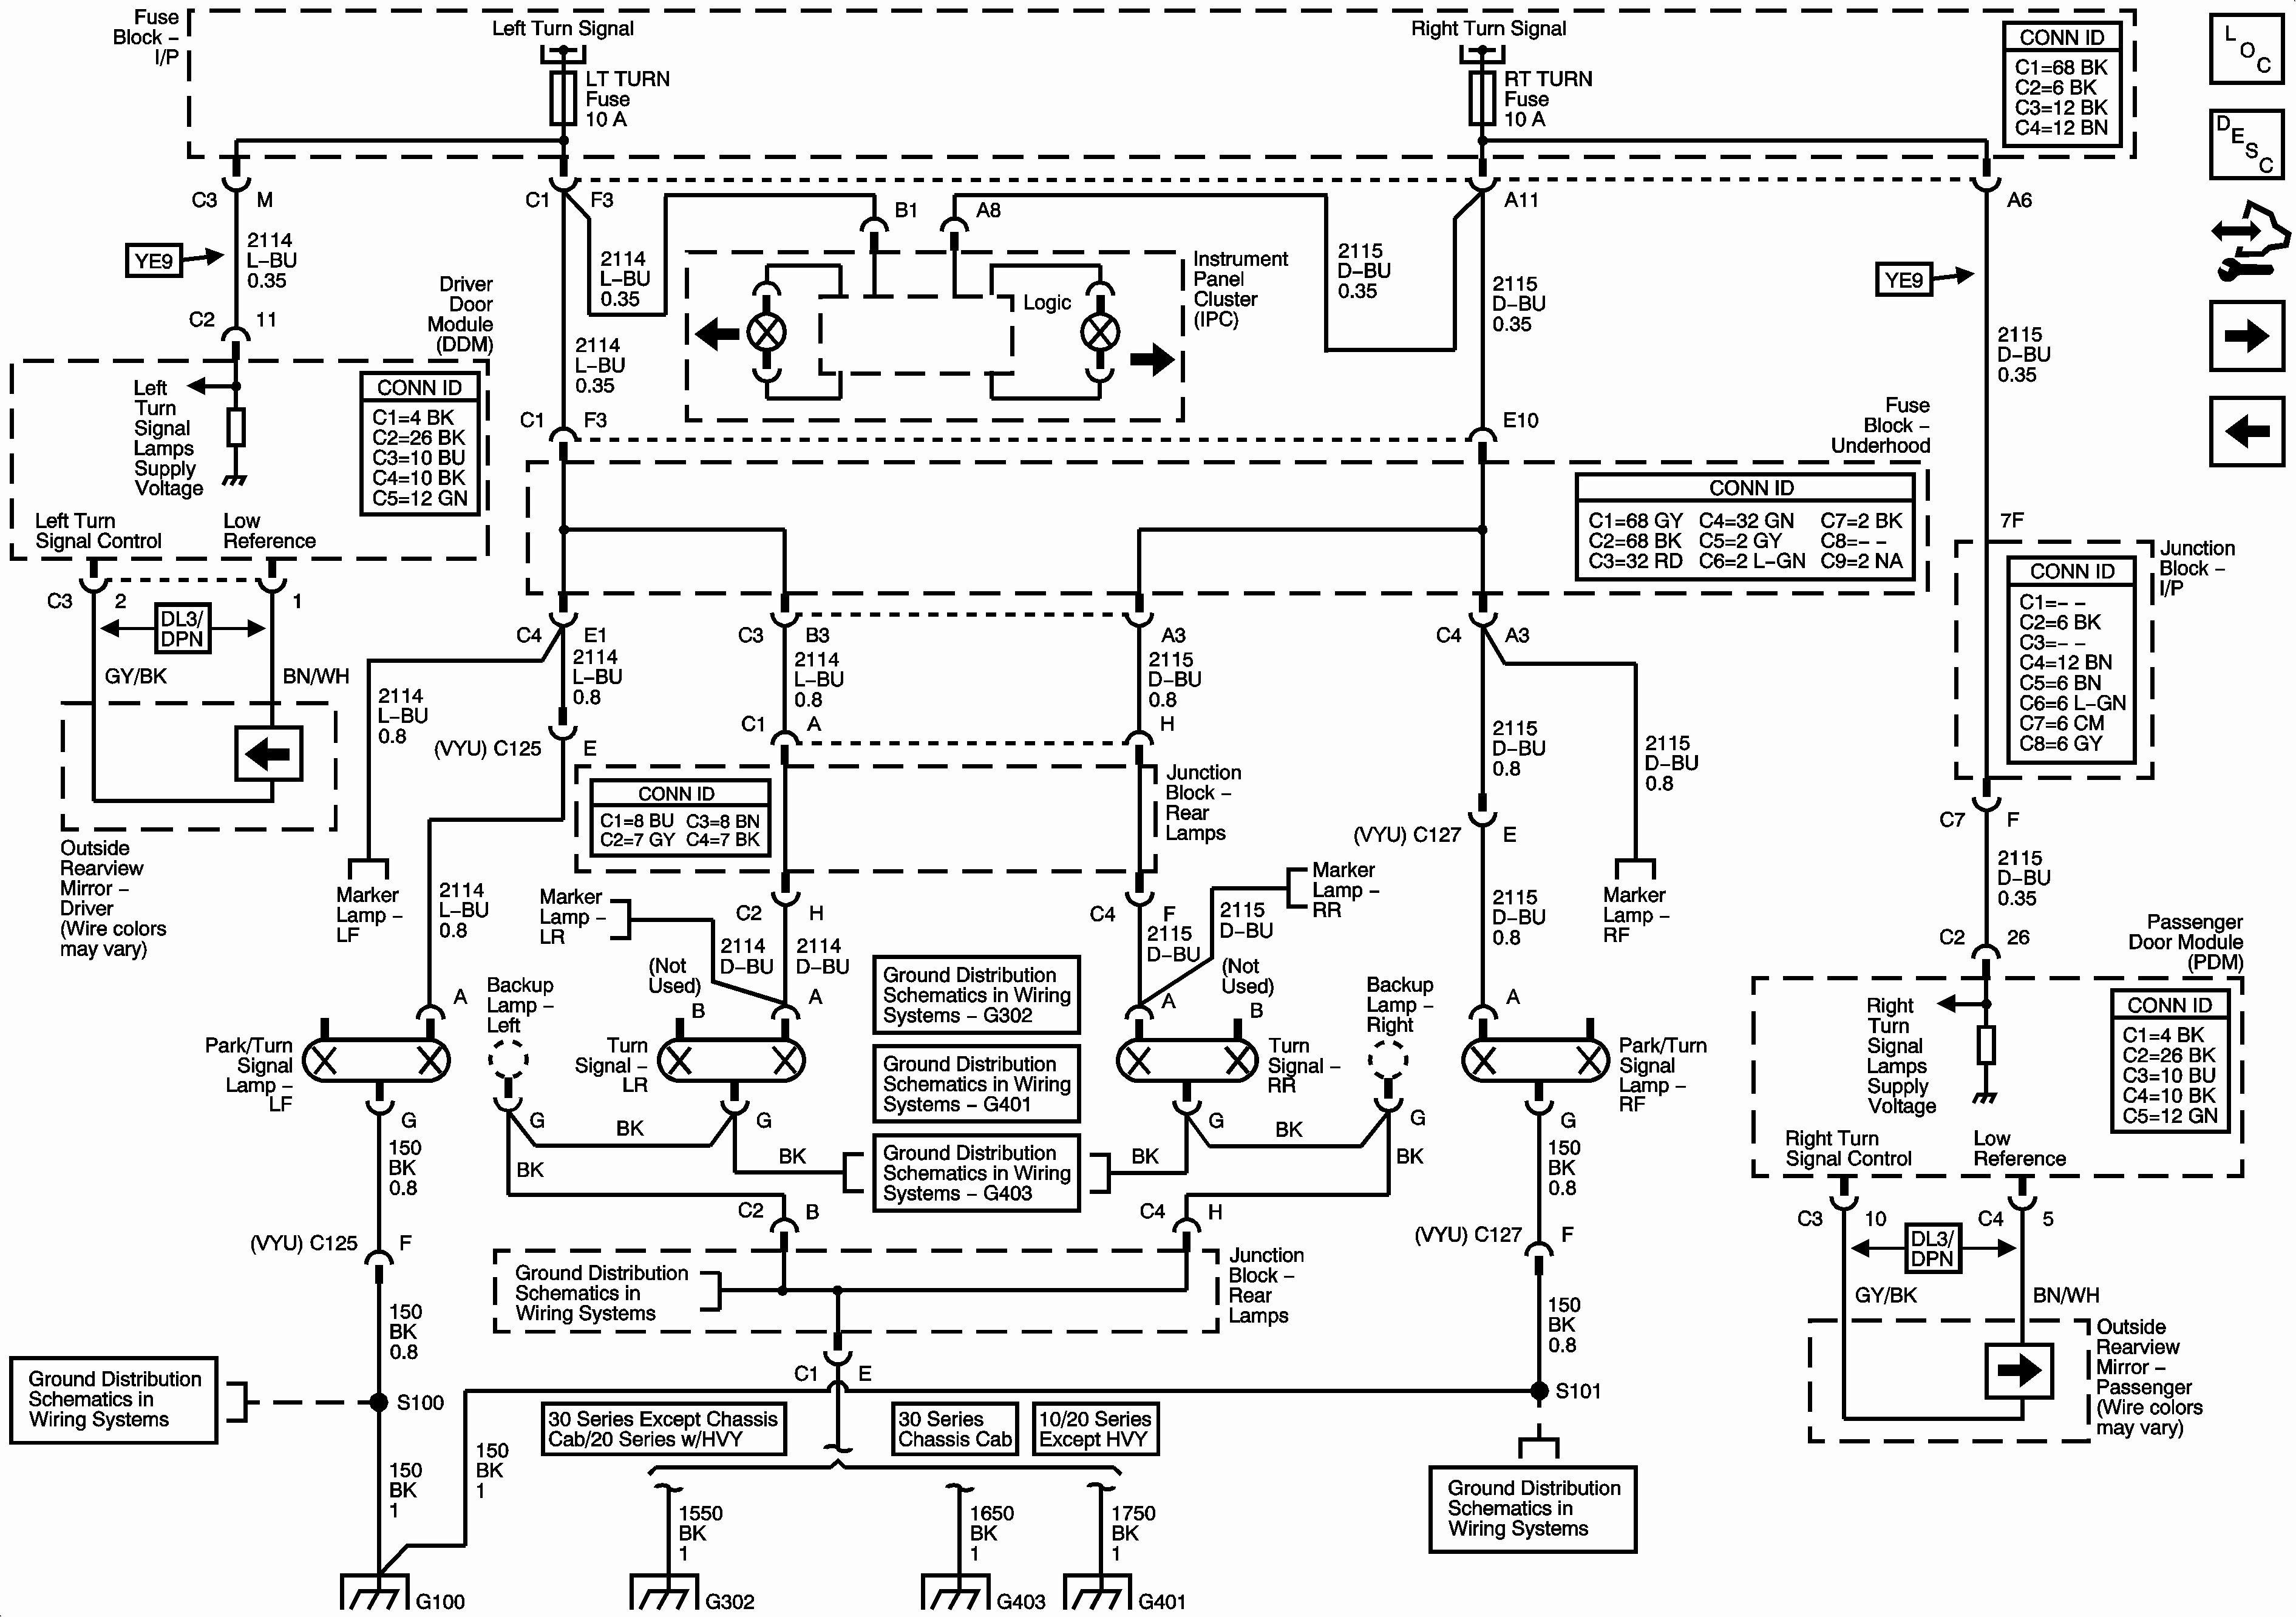 Federal Signal Pa300 Wiring Diagram Beautiful Ls Standalone Wiring - Federal Signal Pa300 Wiring Diagram